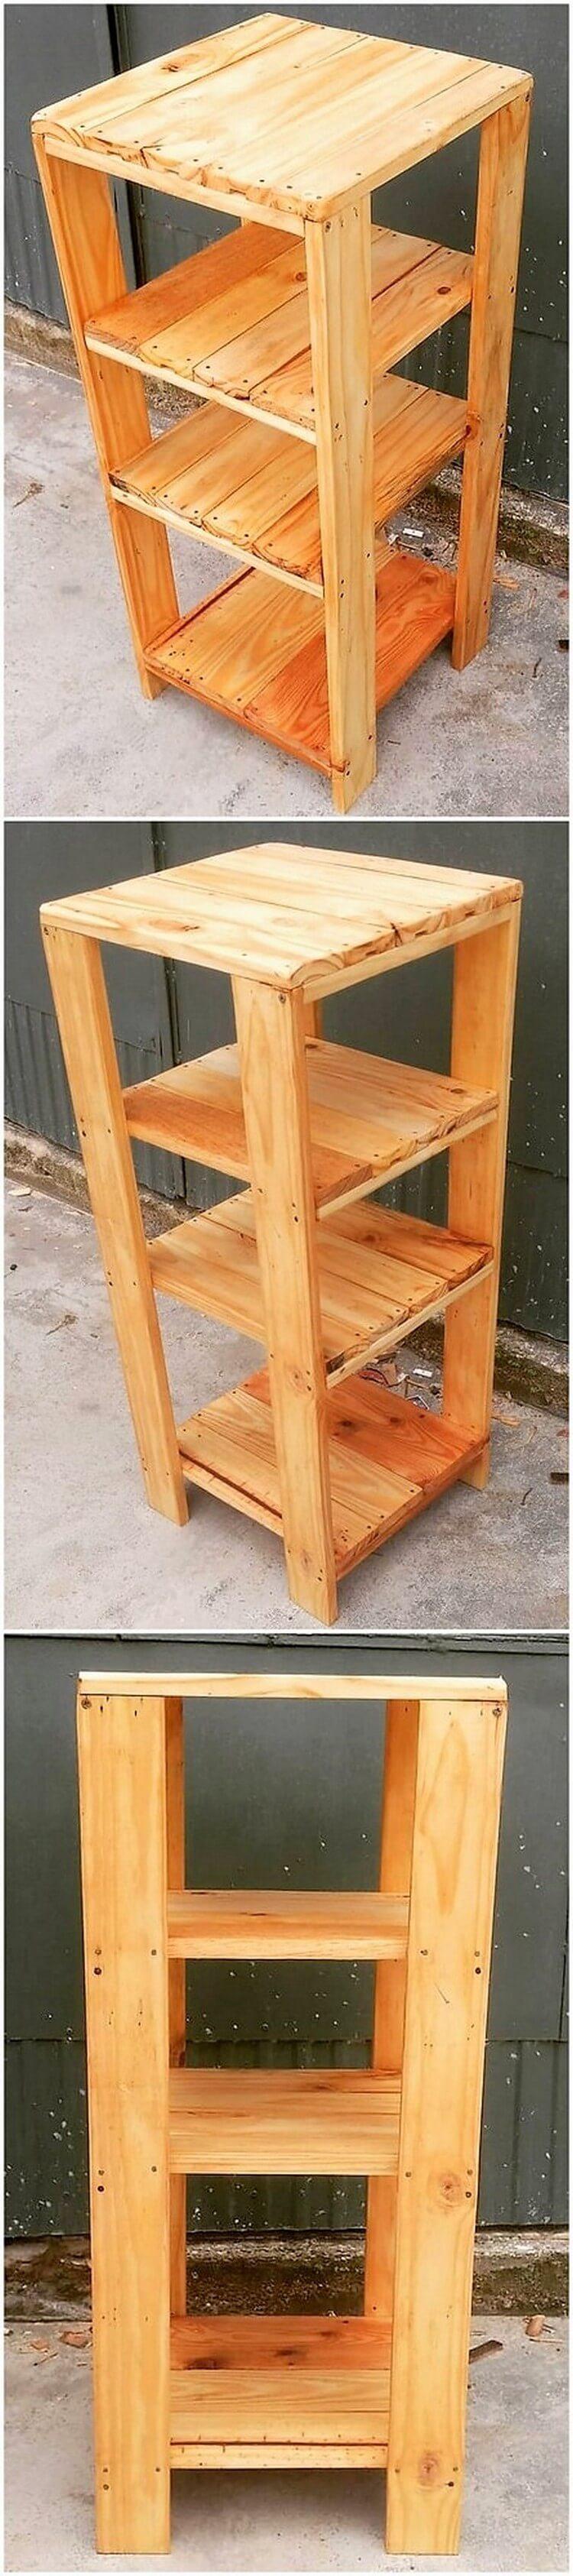 Pallet Shelving Table